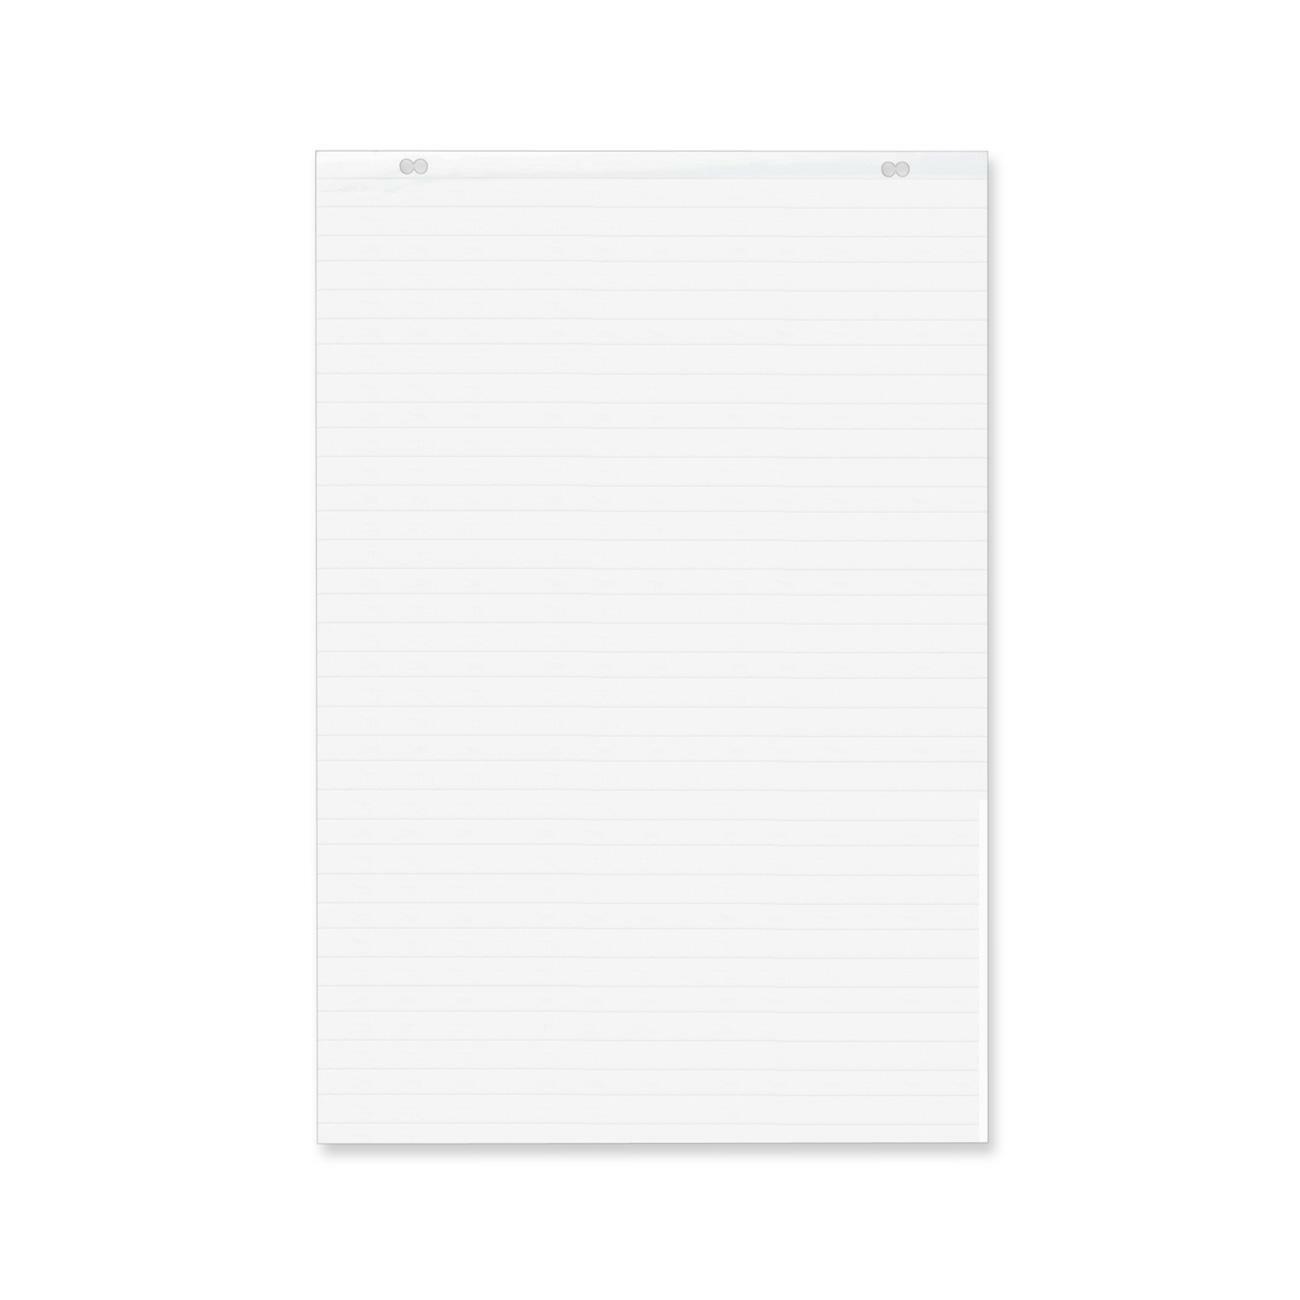 Power Surge Technologies Ltd Office Supplies Paper Pads – Lined Chart Paper